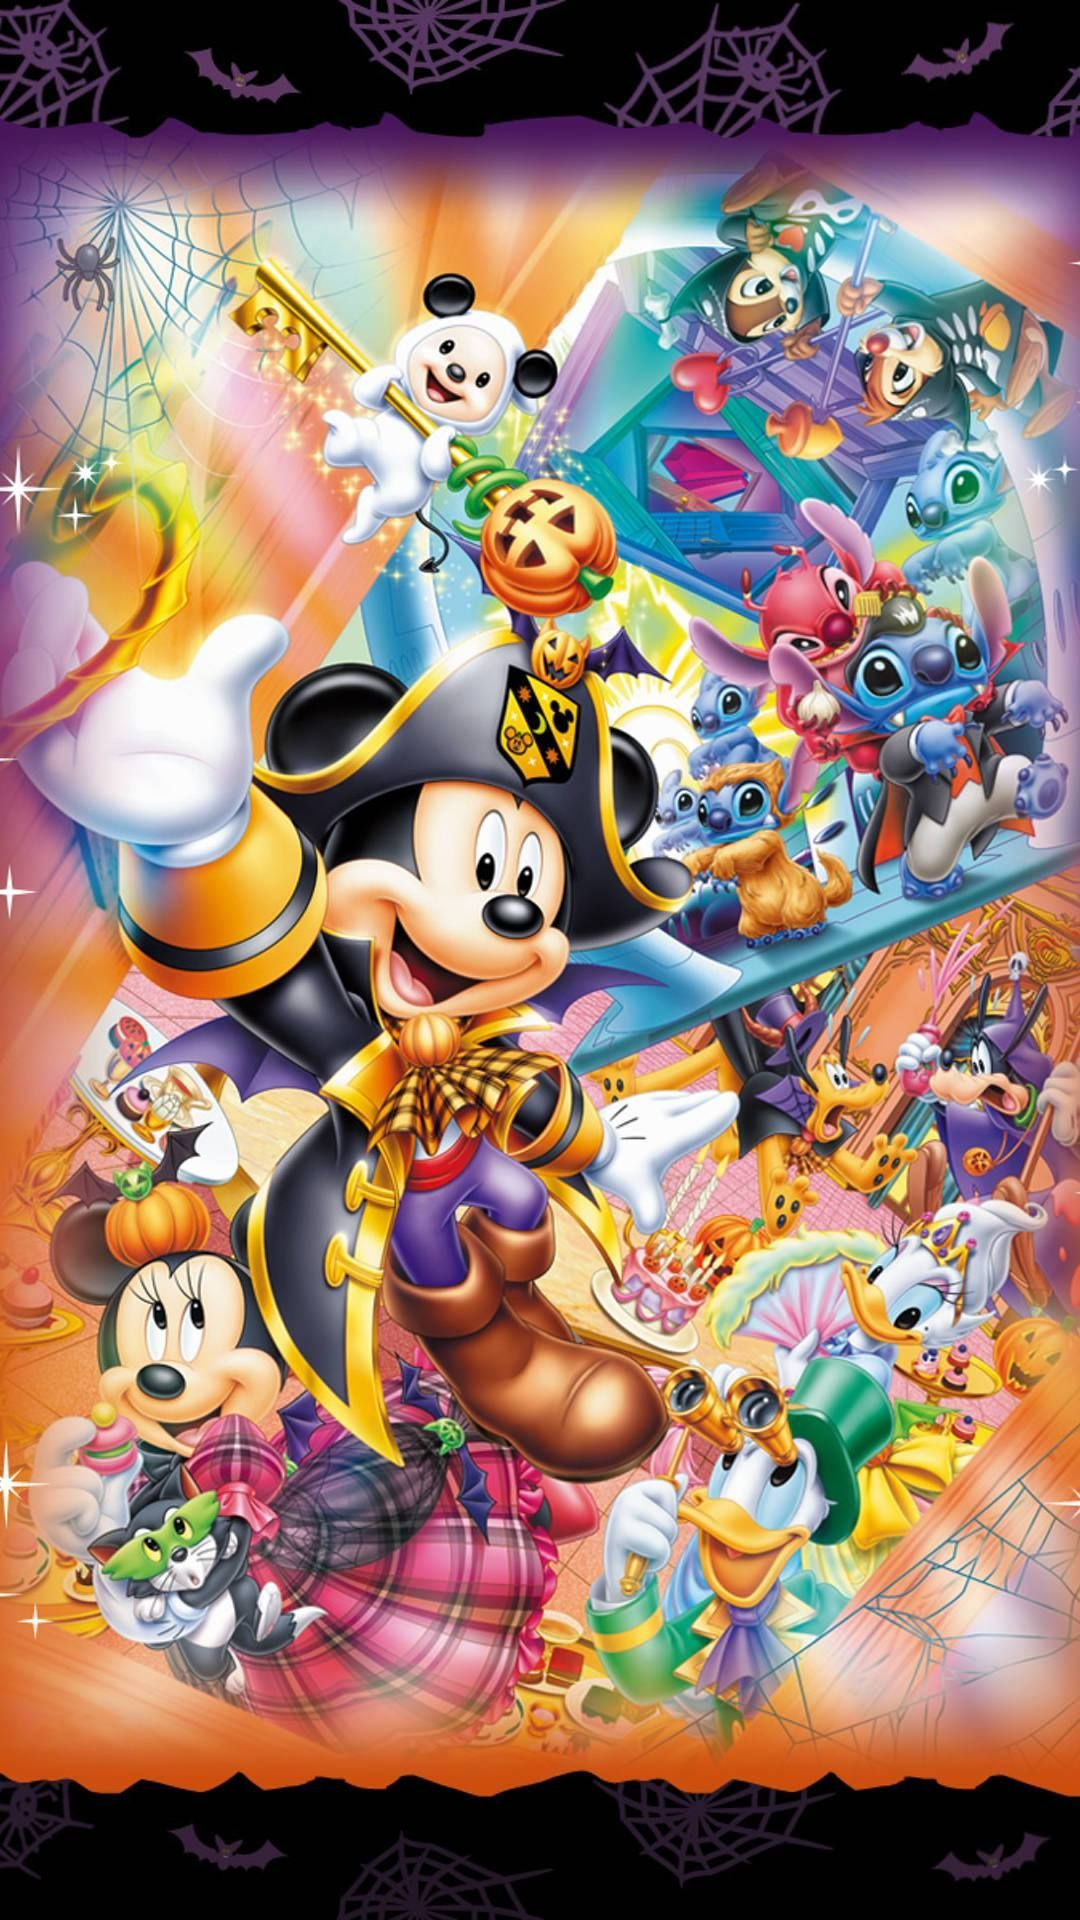 Disney Anime Disney Posters Disney Wallpaper Mickey Mouse Art